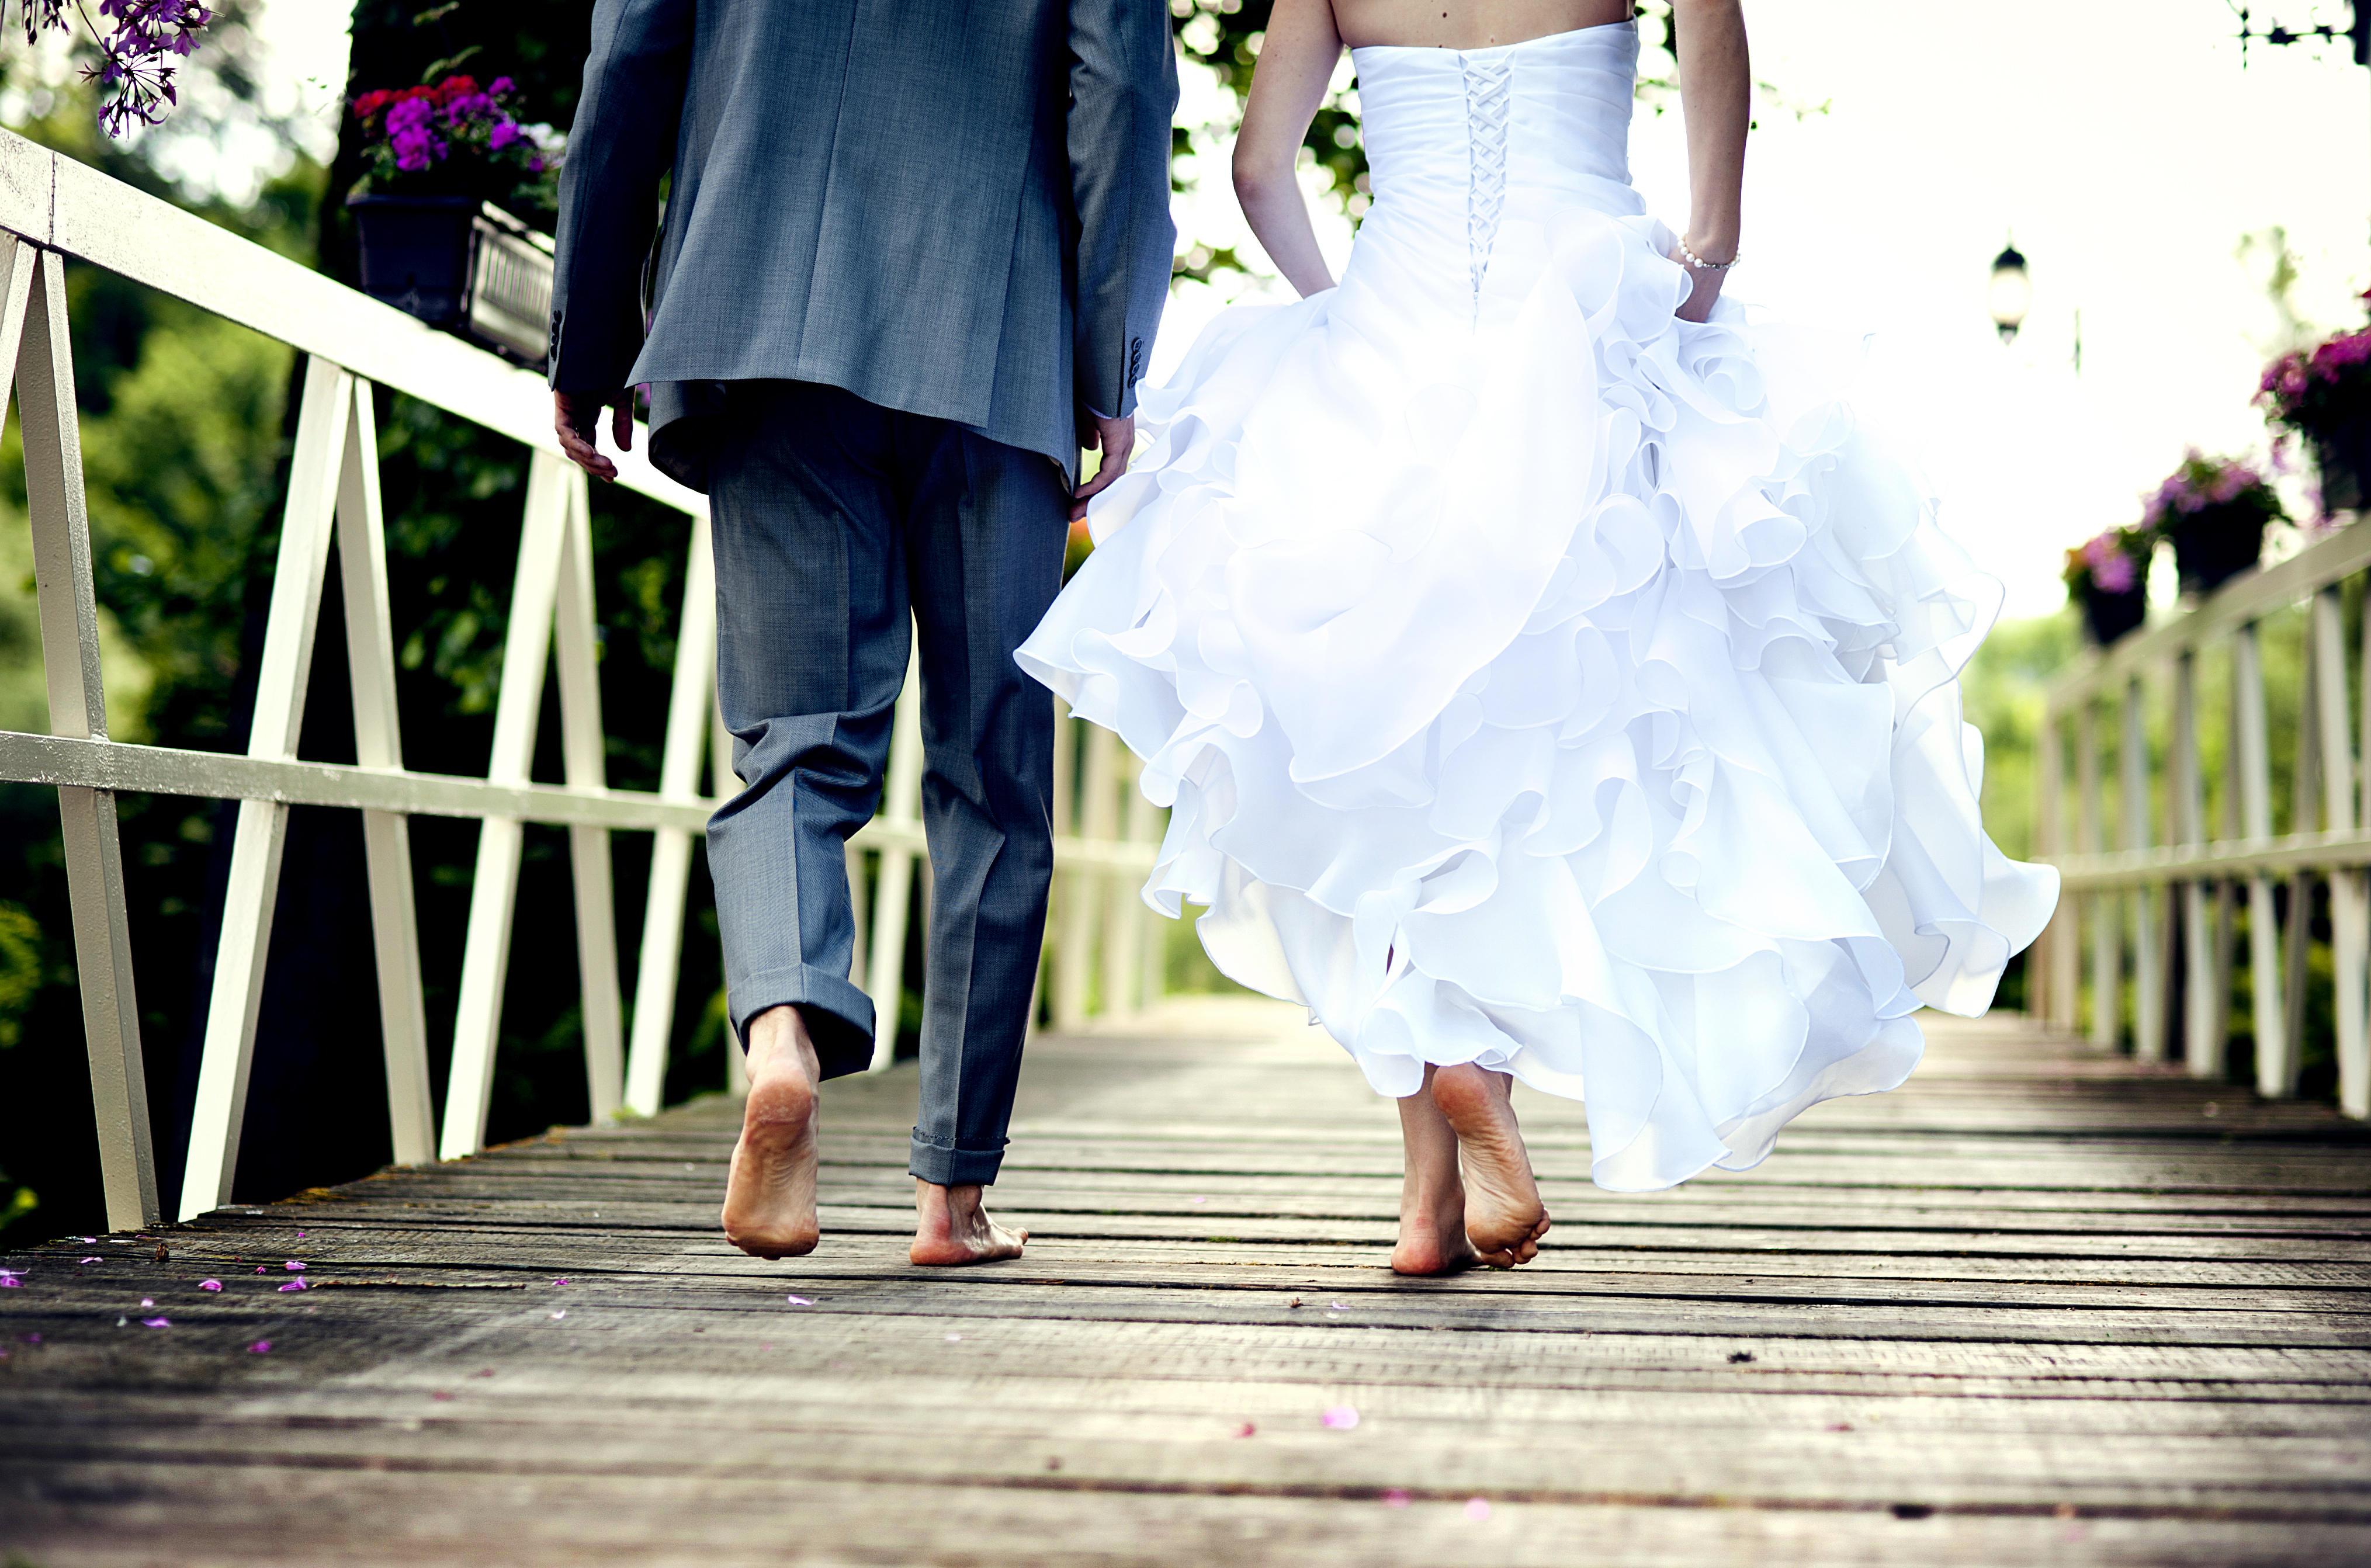 Tot ce trebuie sa stim despre o formatie nunta